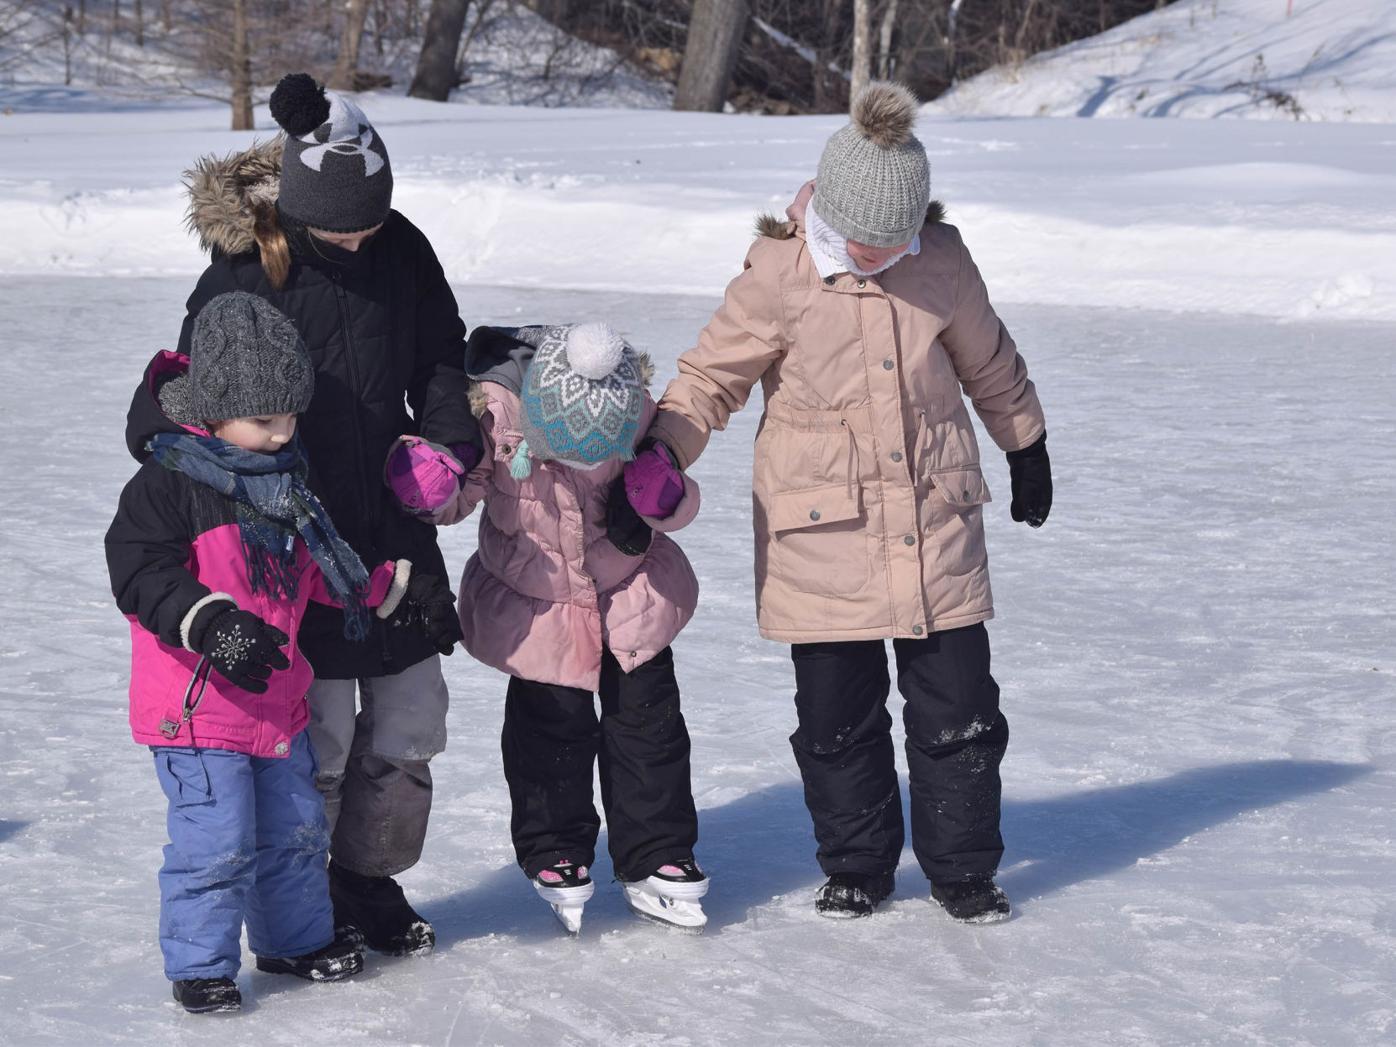 Ice skating 2.jpg